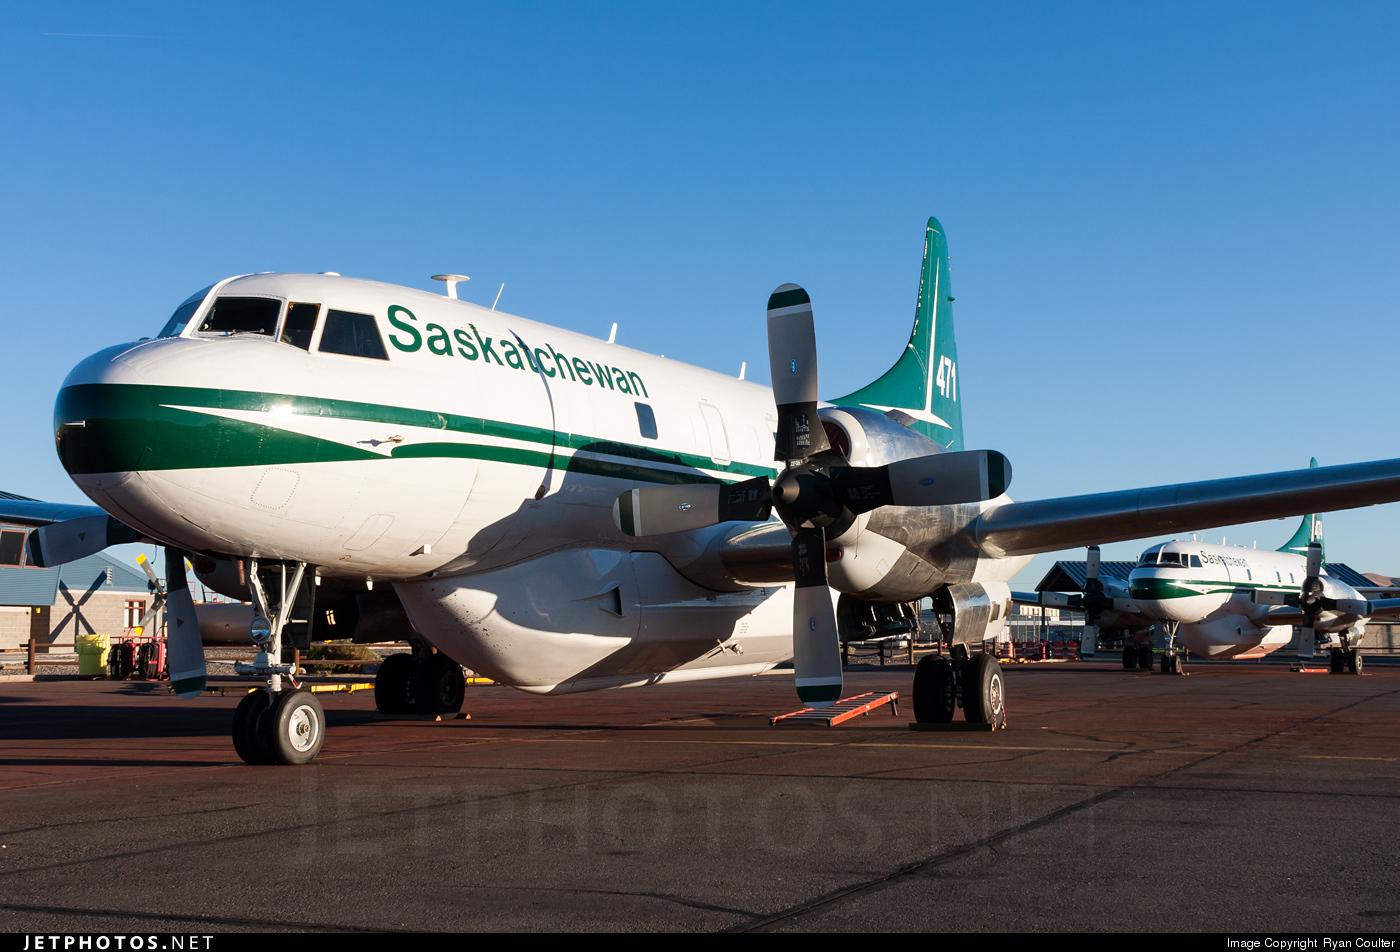 C-GSKR - Convair CV-580 - Canada - Government of Saskatchewan